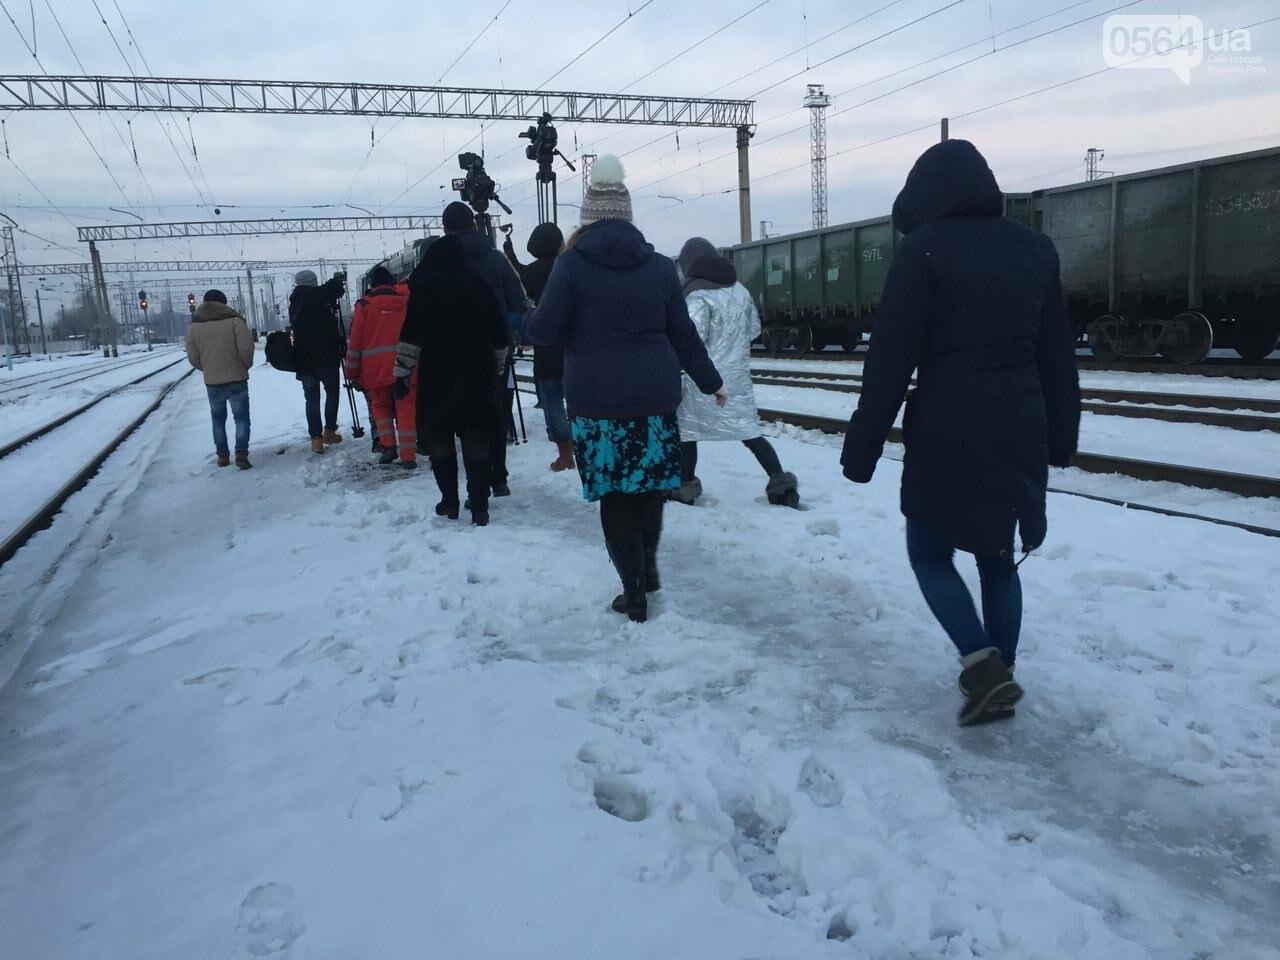 В Кривой Рог вернулся журналист Вячеслав Волк, тяжело раненый во время учений резервистов (ФОТО), фото-9